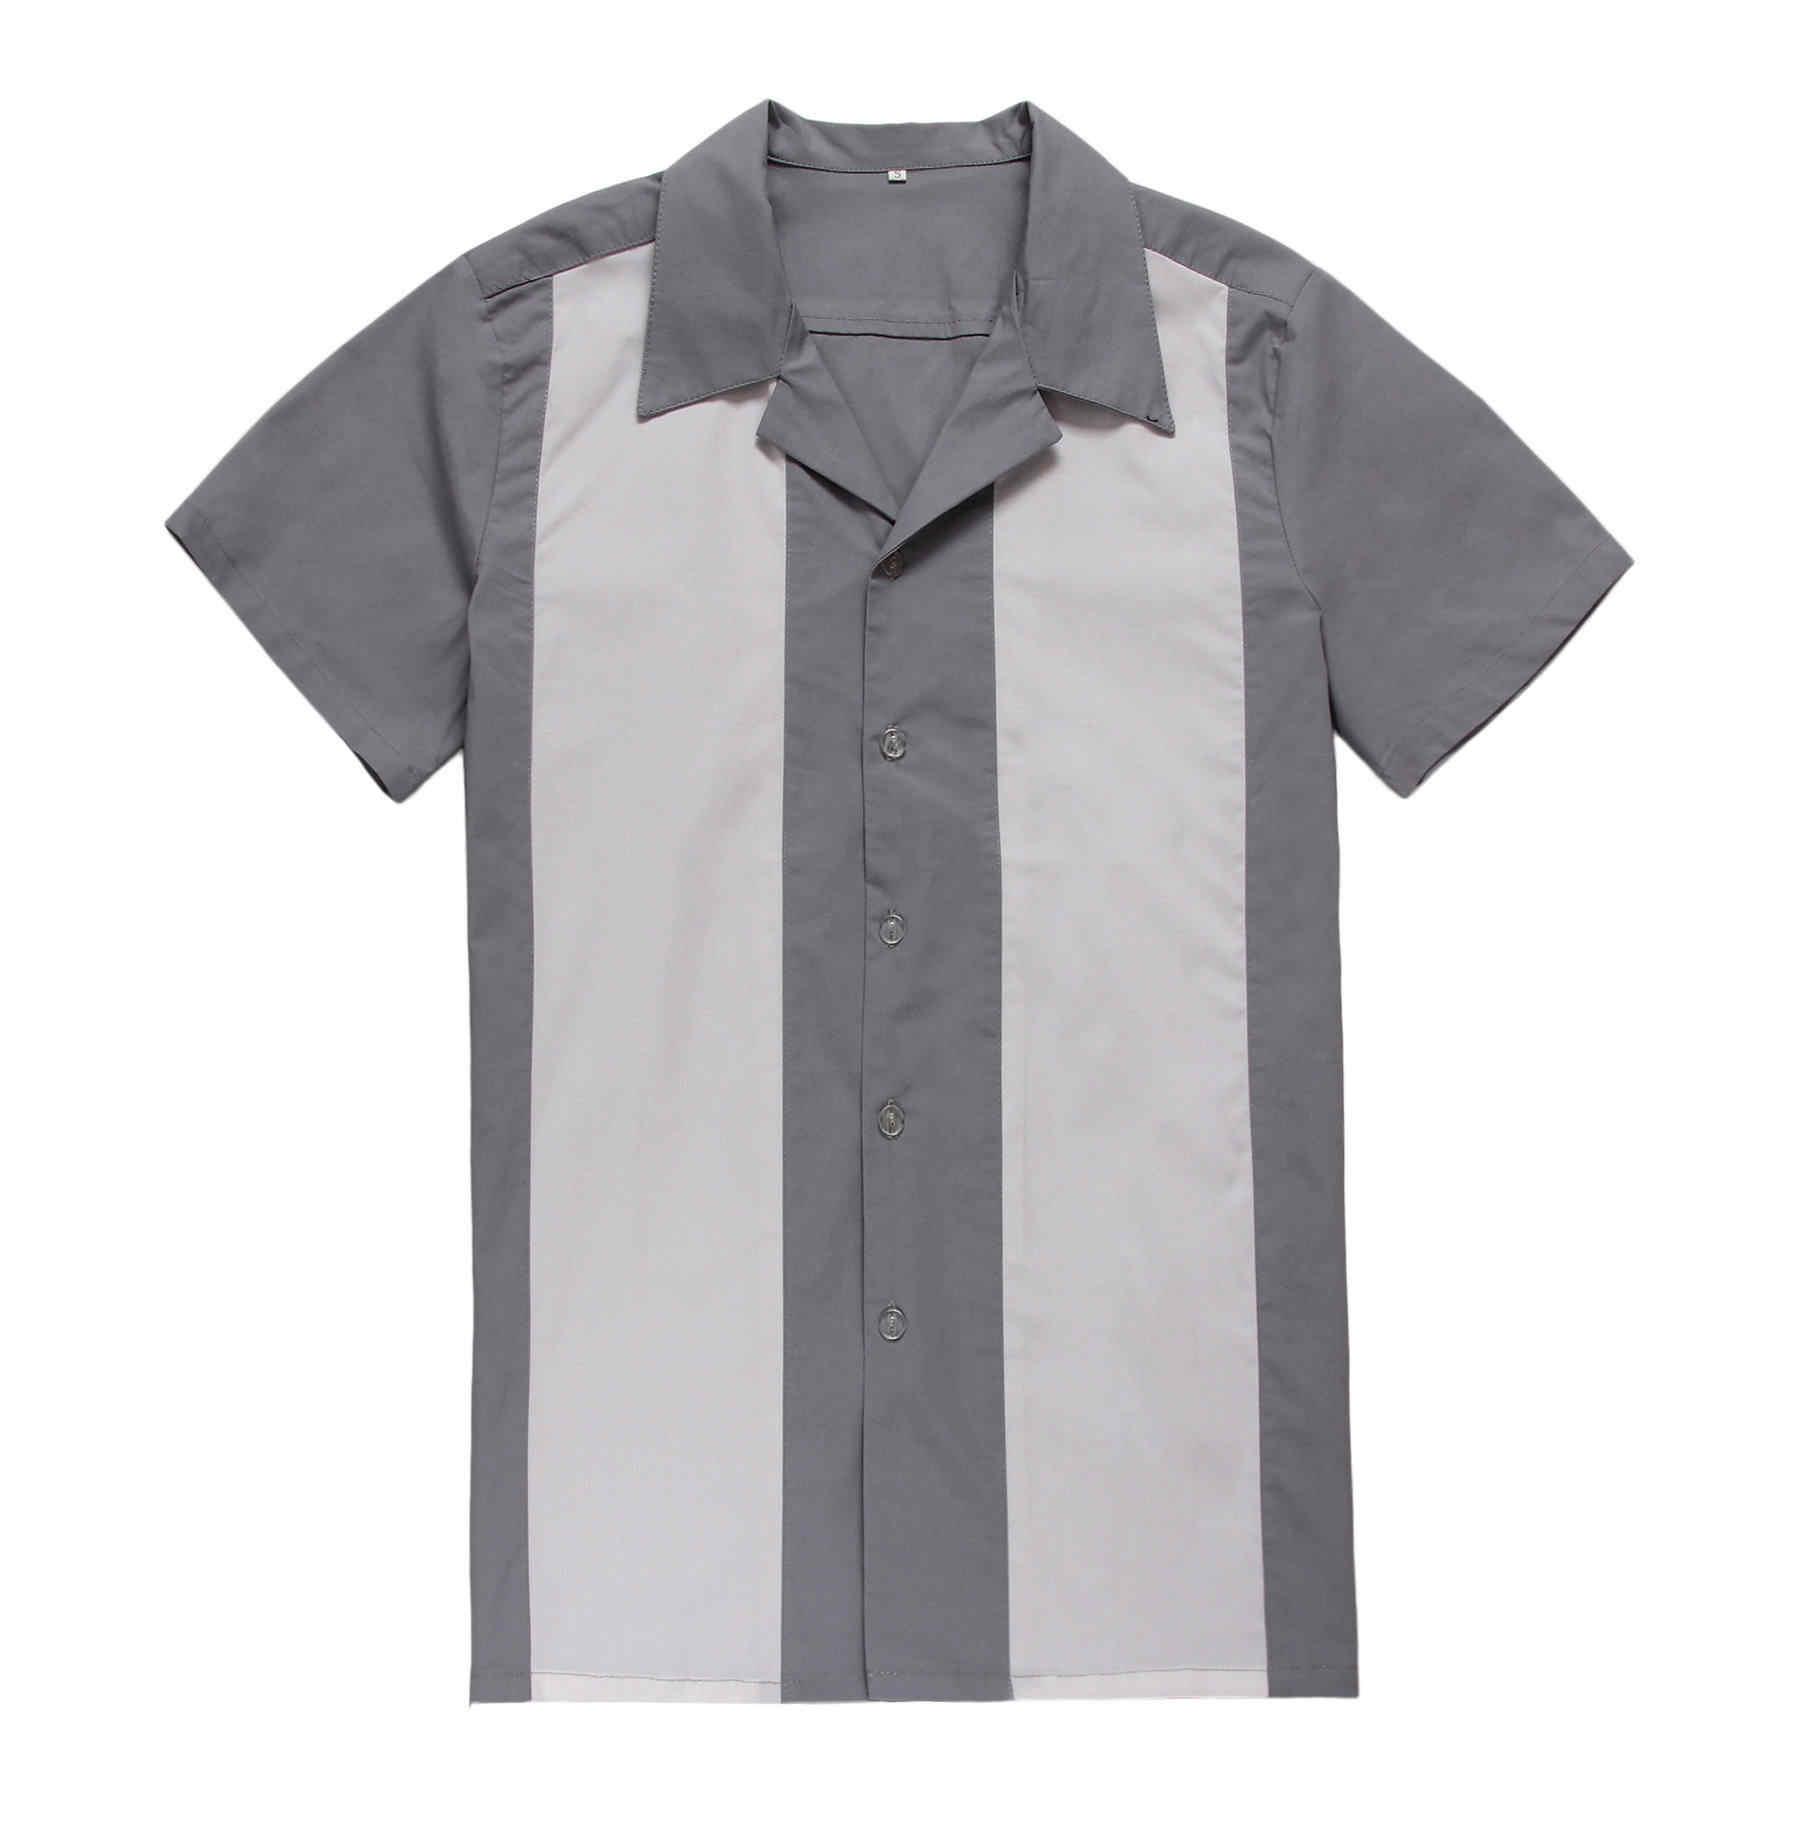 257dd9b57aff CandowLook Online Shopping Men Cotton Short Sleeve Stylish American Vintage  Casual Designs Rockabilly Panel Shirts for